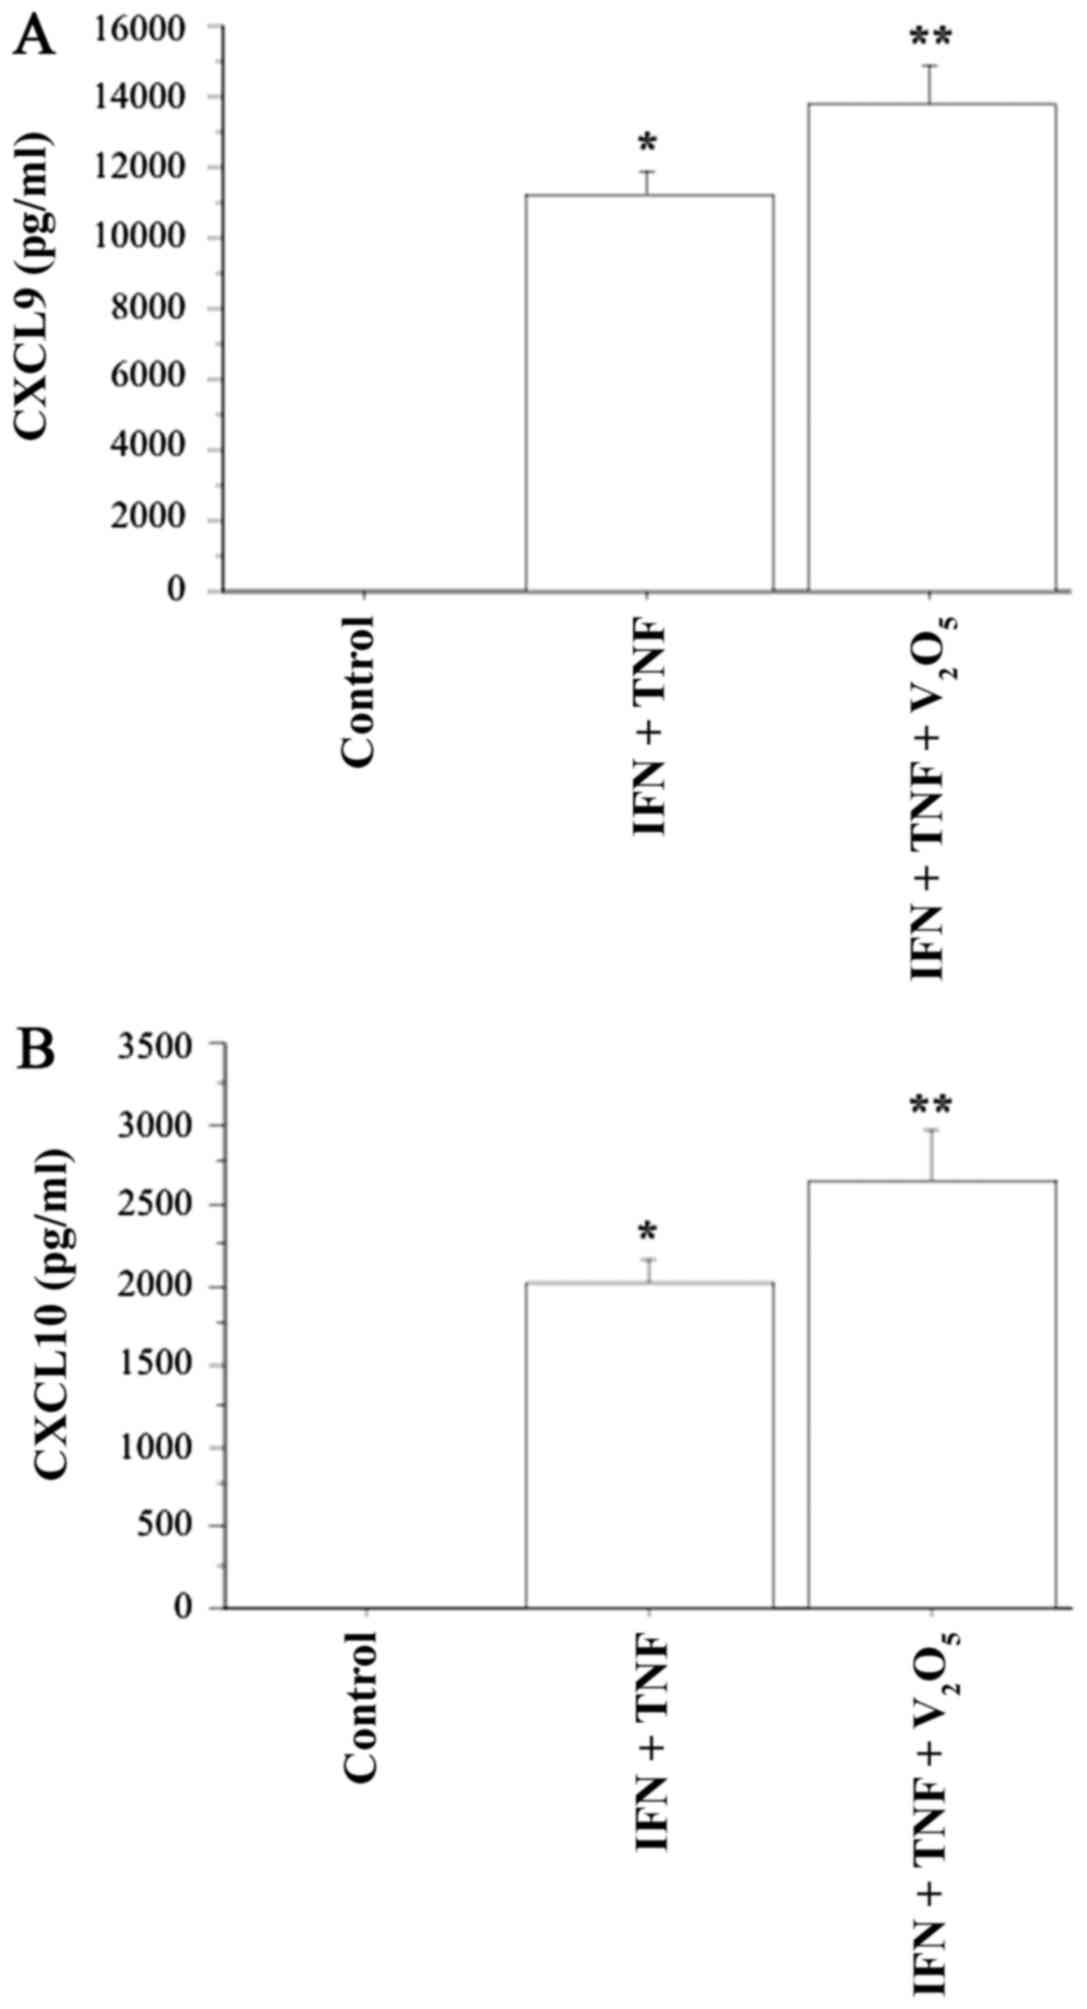 Induction of Th1 chemokine secretion in dermal fibroblasts